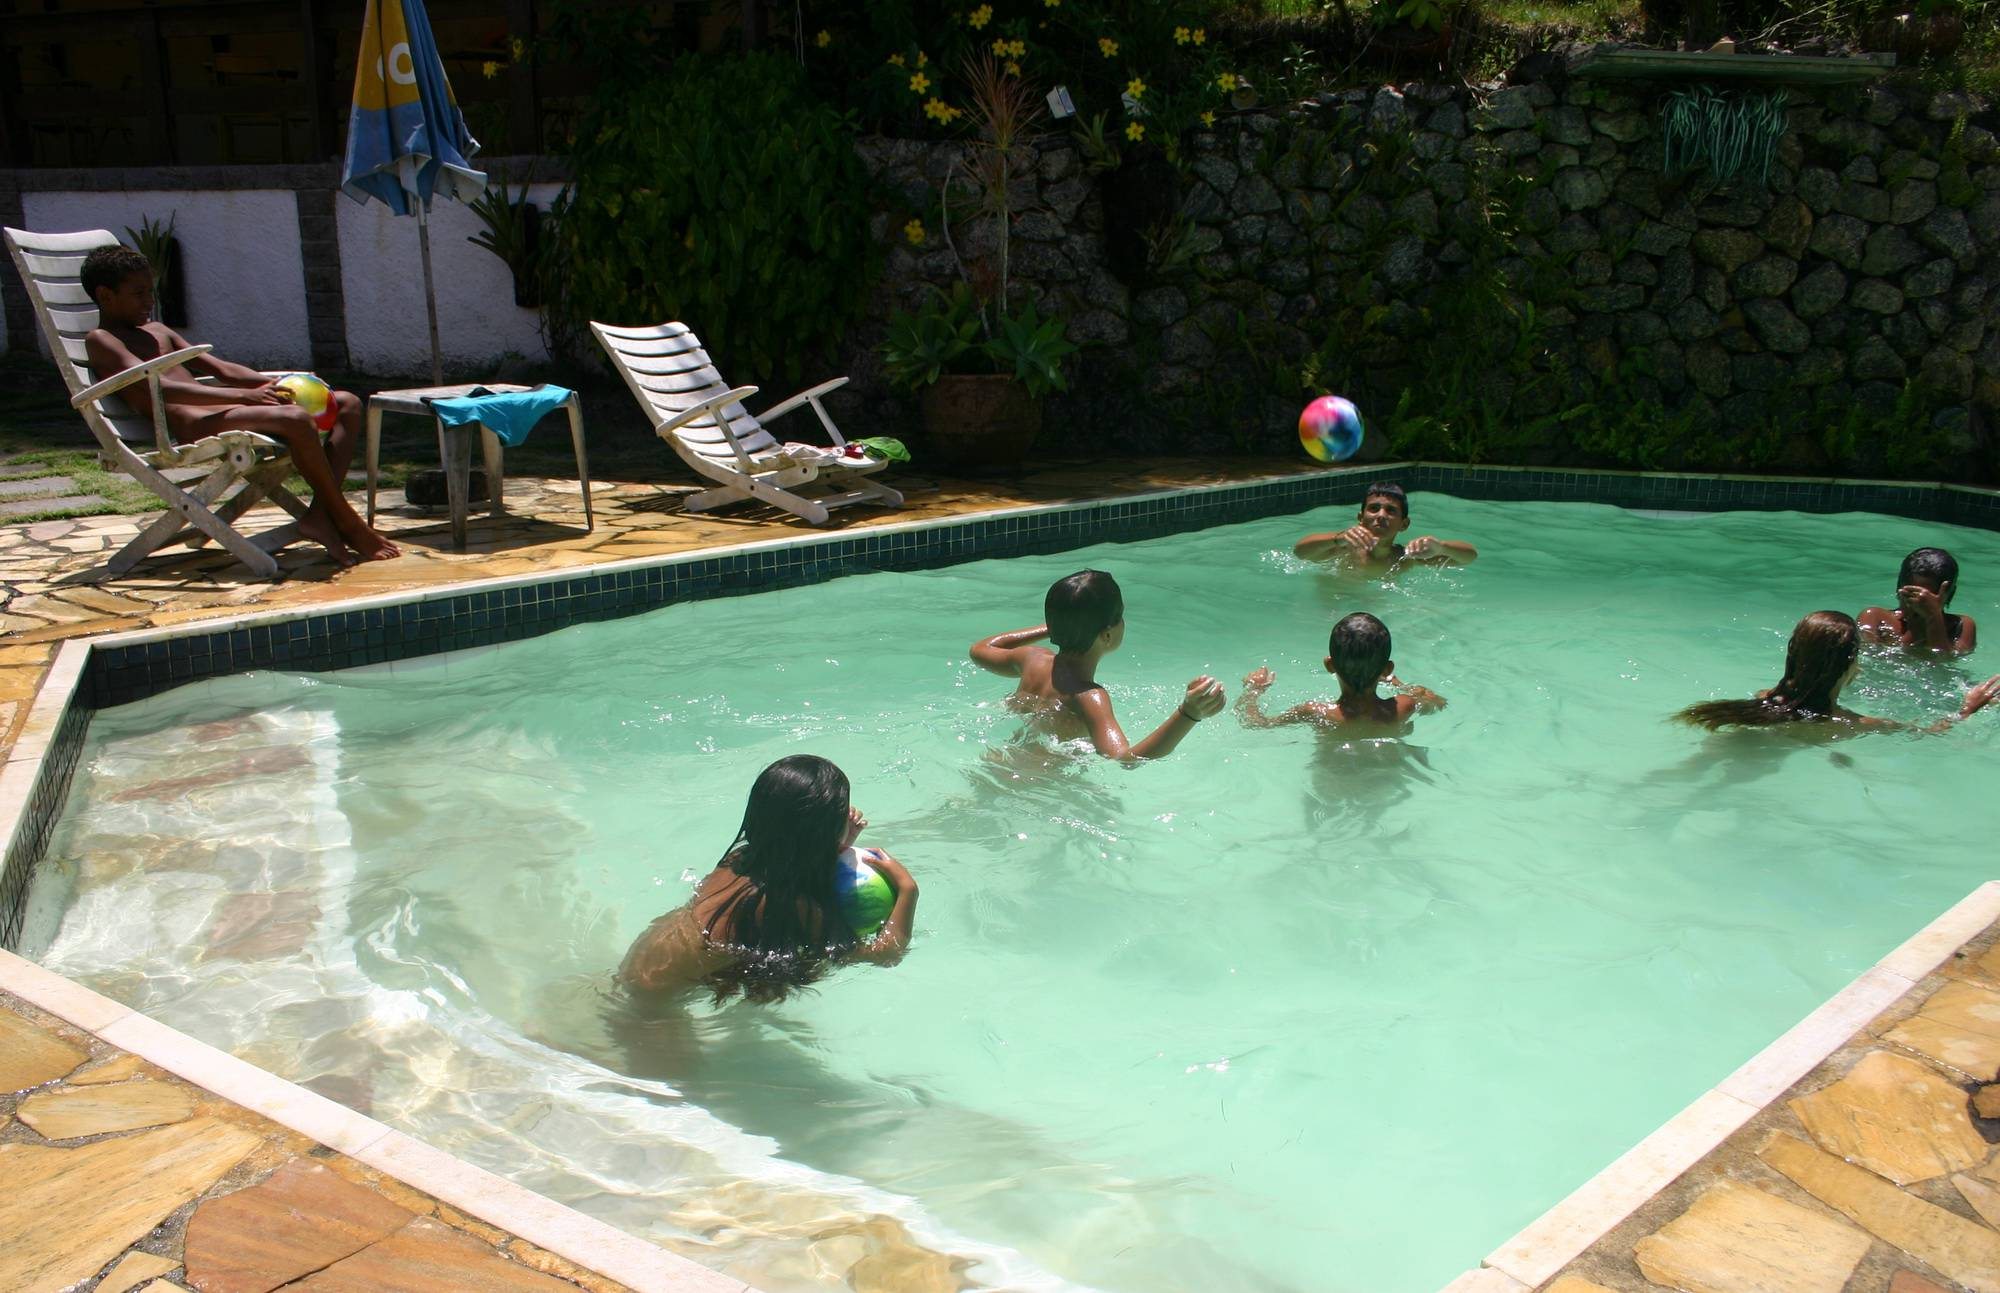 Nudist Pics Brazilian Our Outdoor Pool - 1